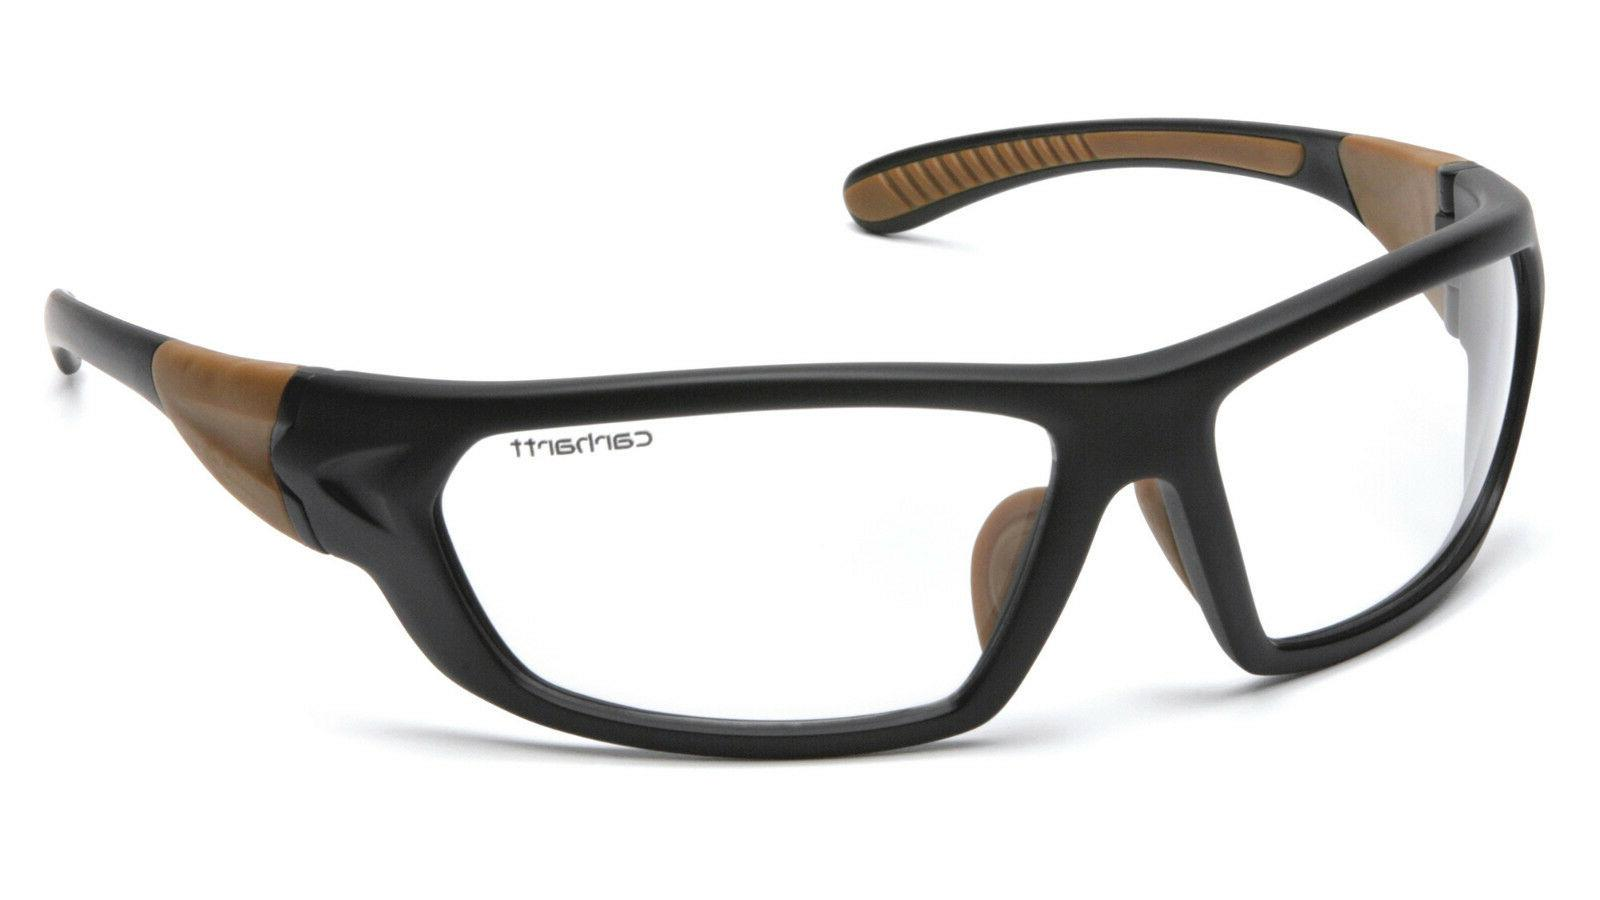 carbondale safety glasses with black frame